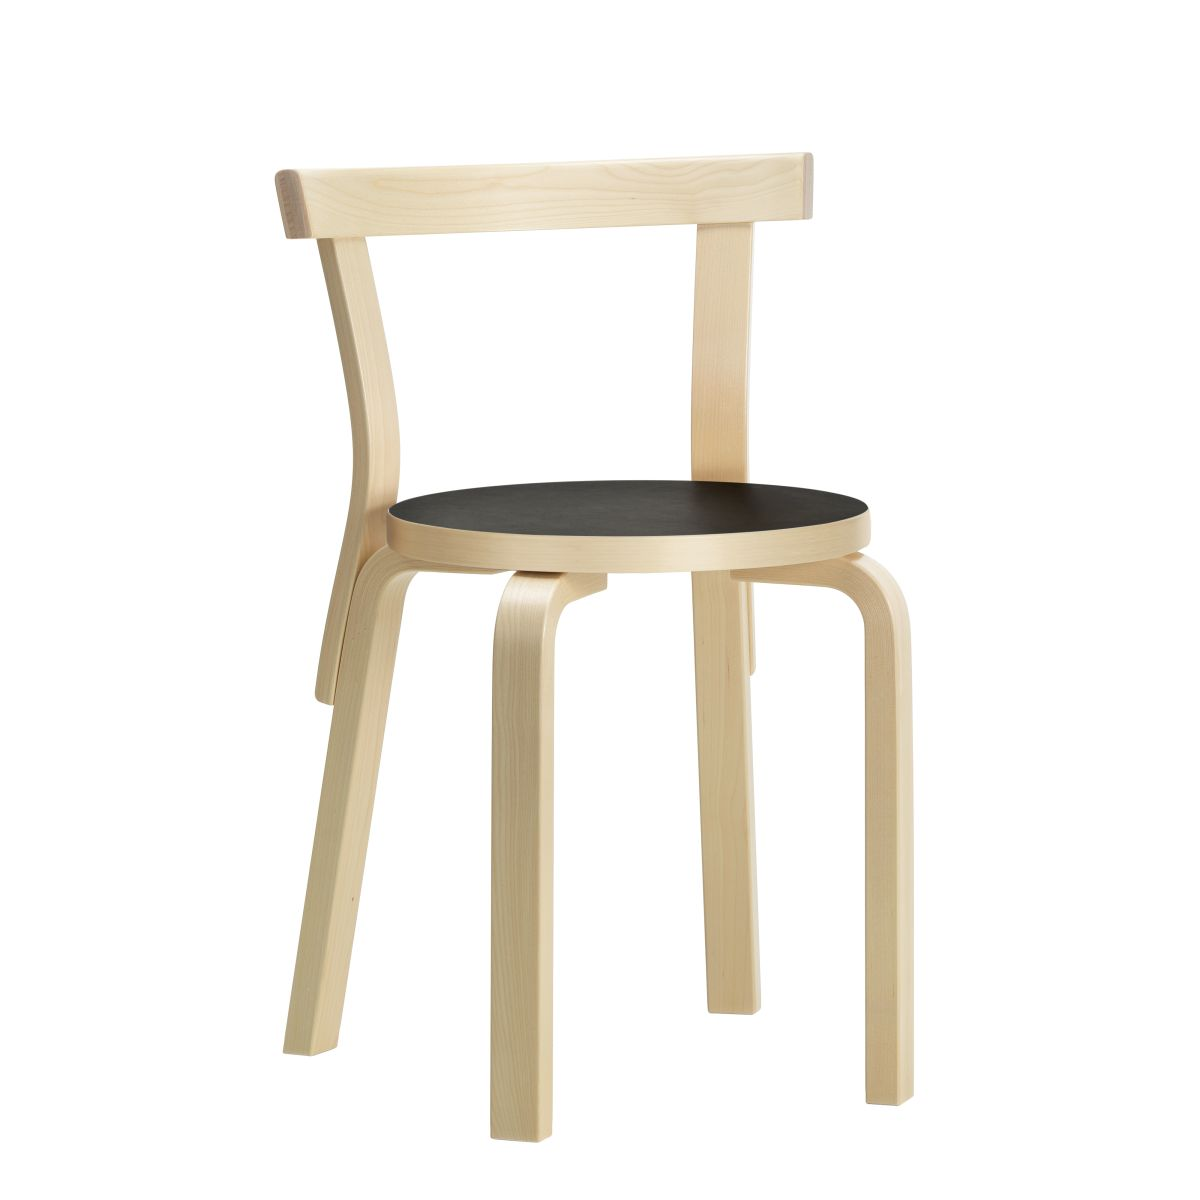 Chair-68-birch-natural-lacquered-seat-black-linoleum_F-2912693